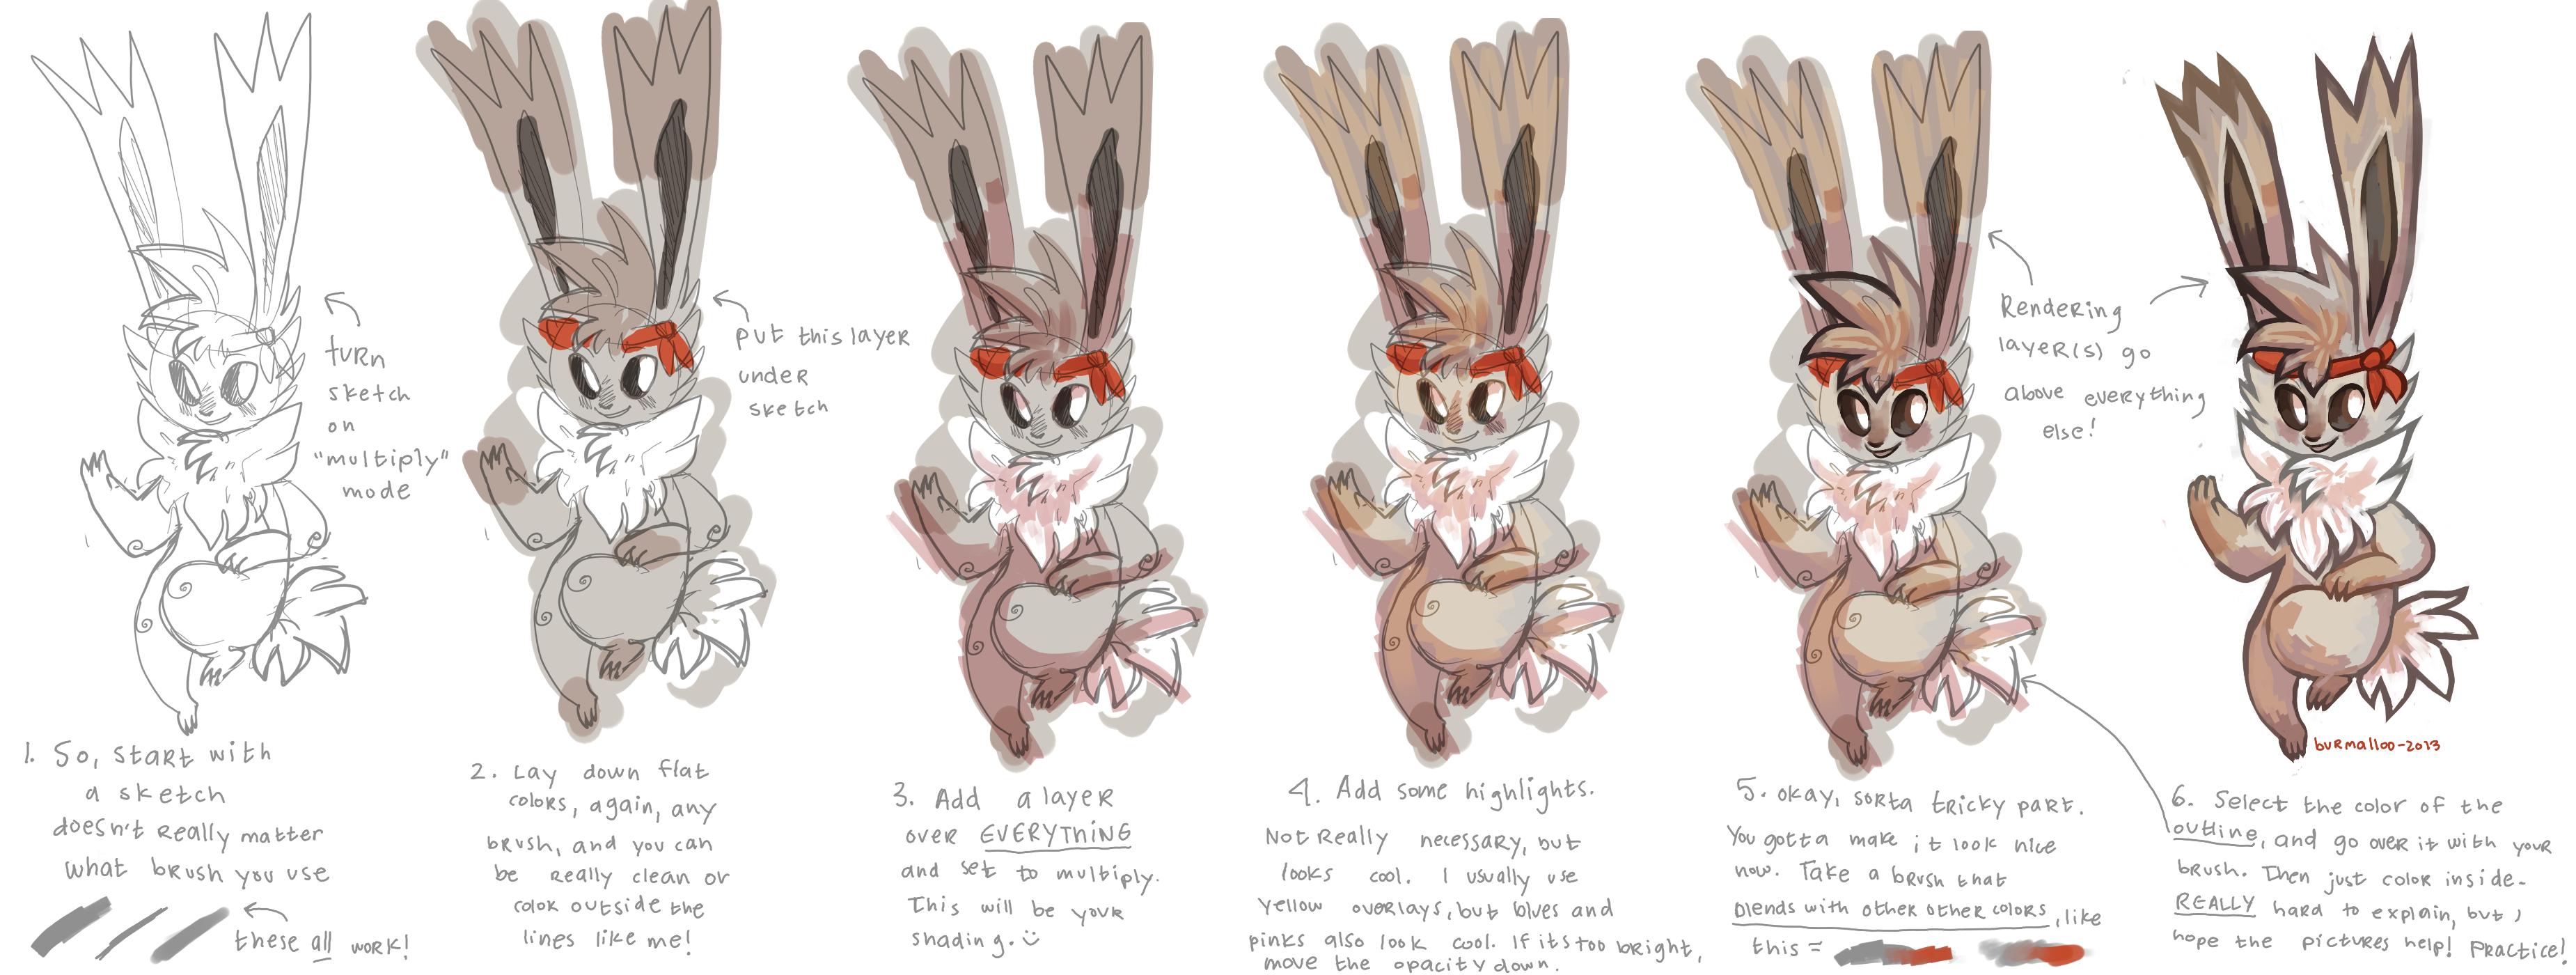 Burmii's painty tutorial by burmalloo